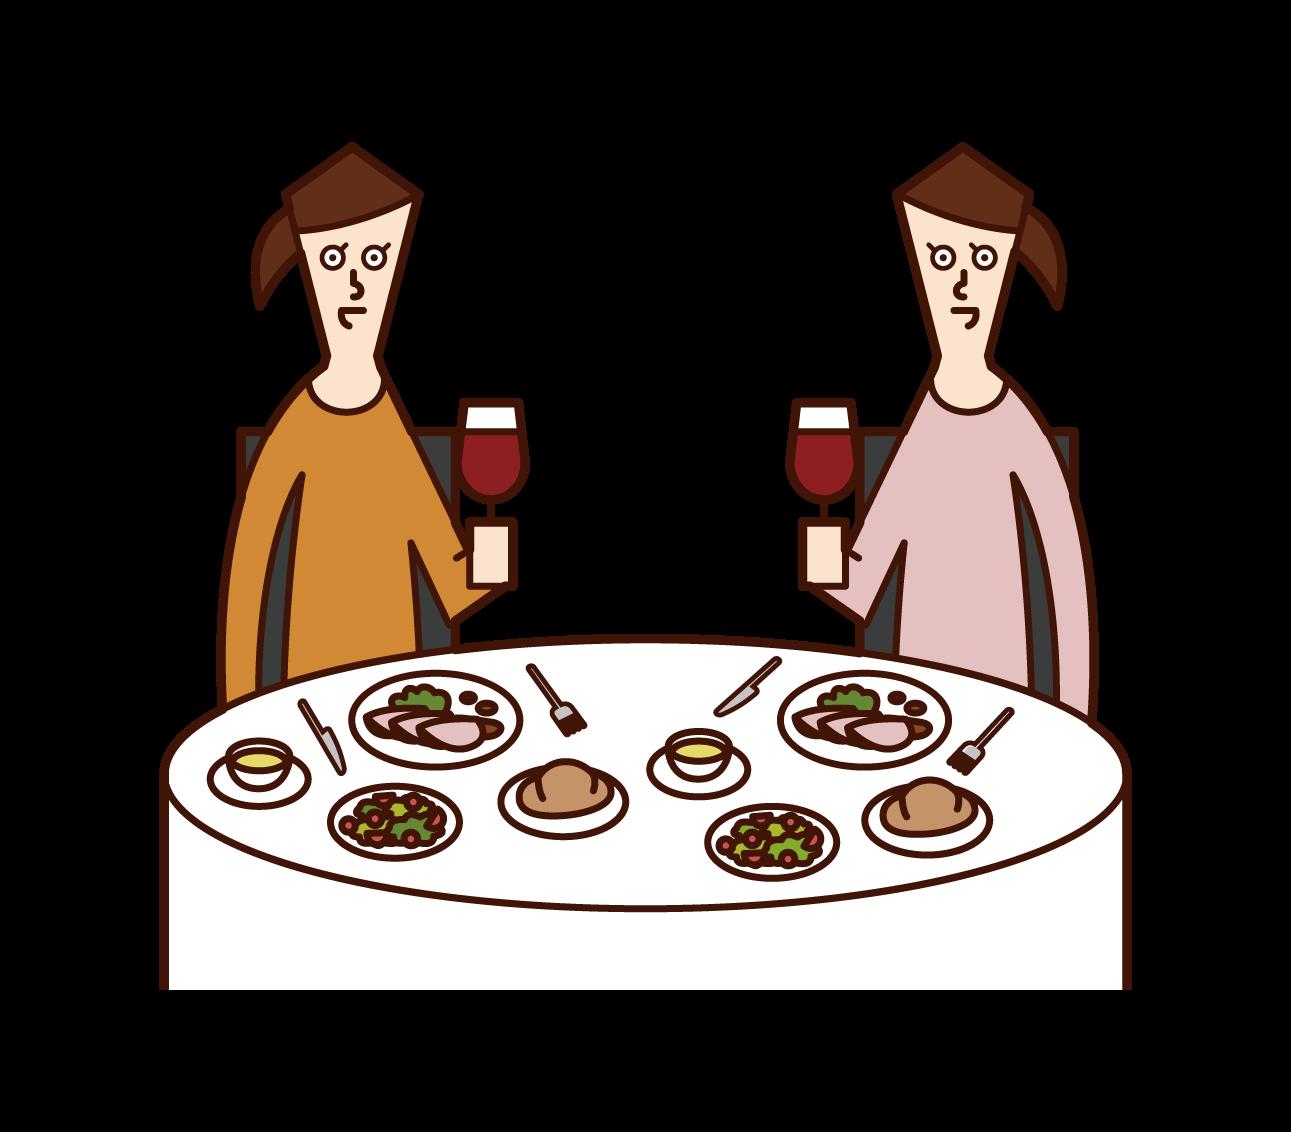 Illustration of people (women) enjoying dinner at a restaurant